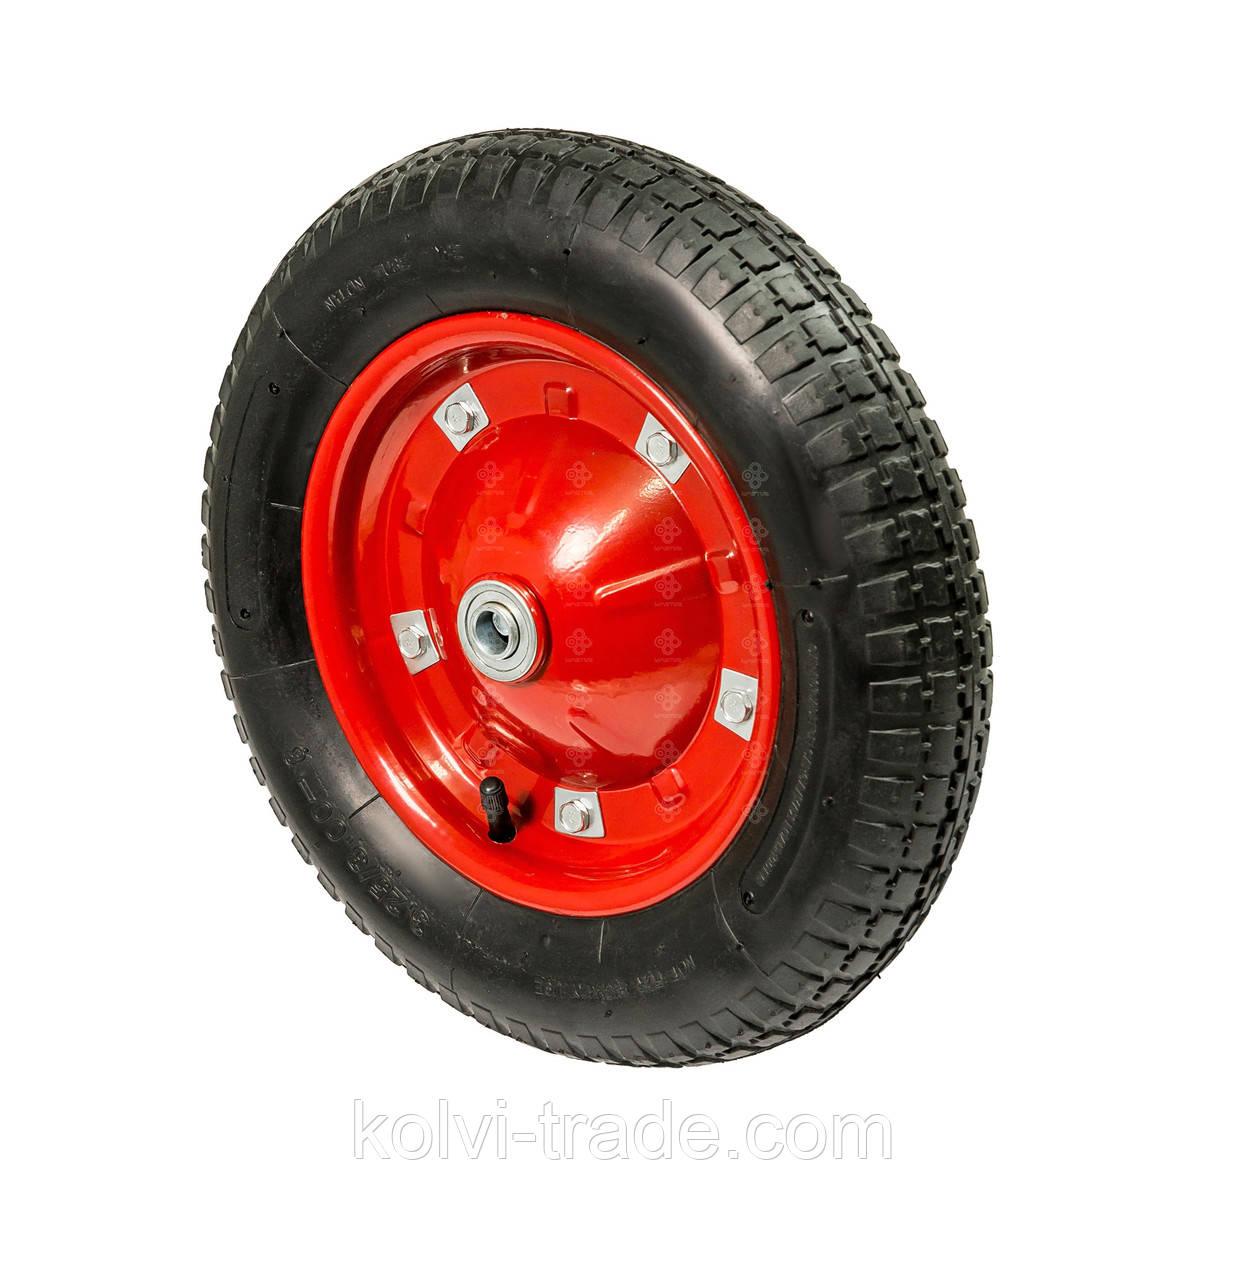 Колеса без кронштейна Серия 28 с шариковыми подшипниками Диаметр: 350мм.